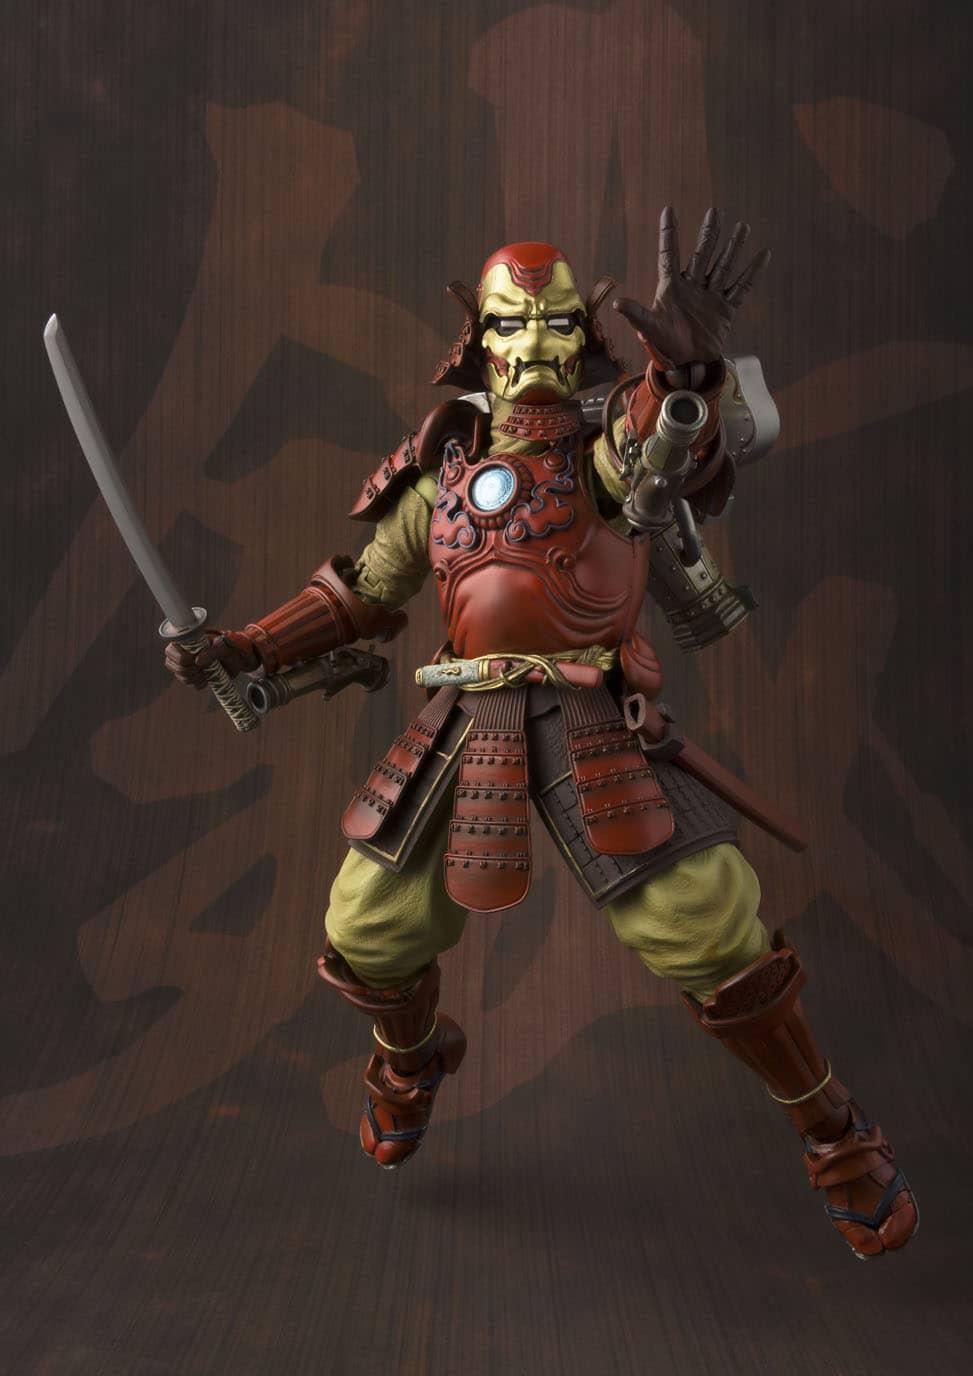 IRON MAN SAMURAI MK3 FIGURA 18 CM MARVEL MEISHO MANGA REALIZATION